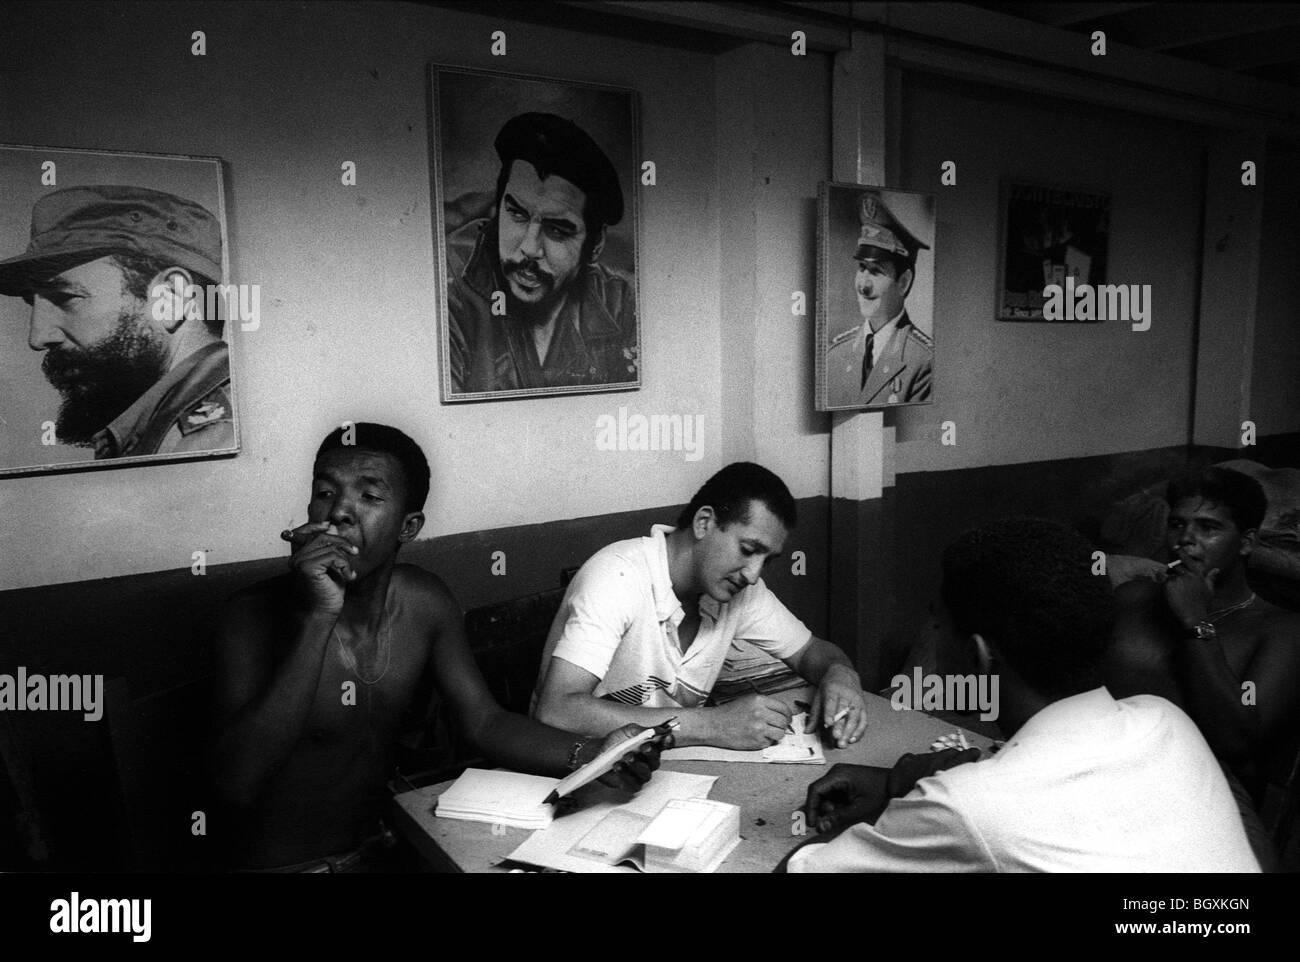 Workers in the H. Upmann Habanos SA cigar factory, Havana, Cuba, May 1993. - Stock Image